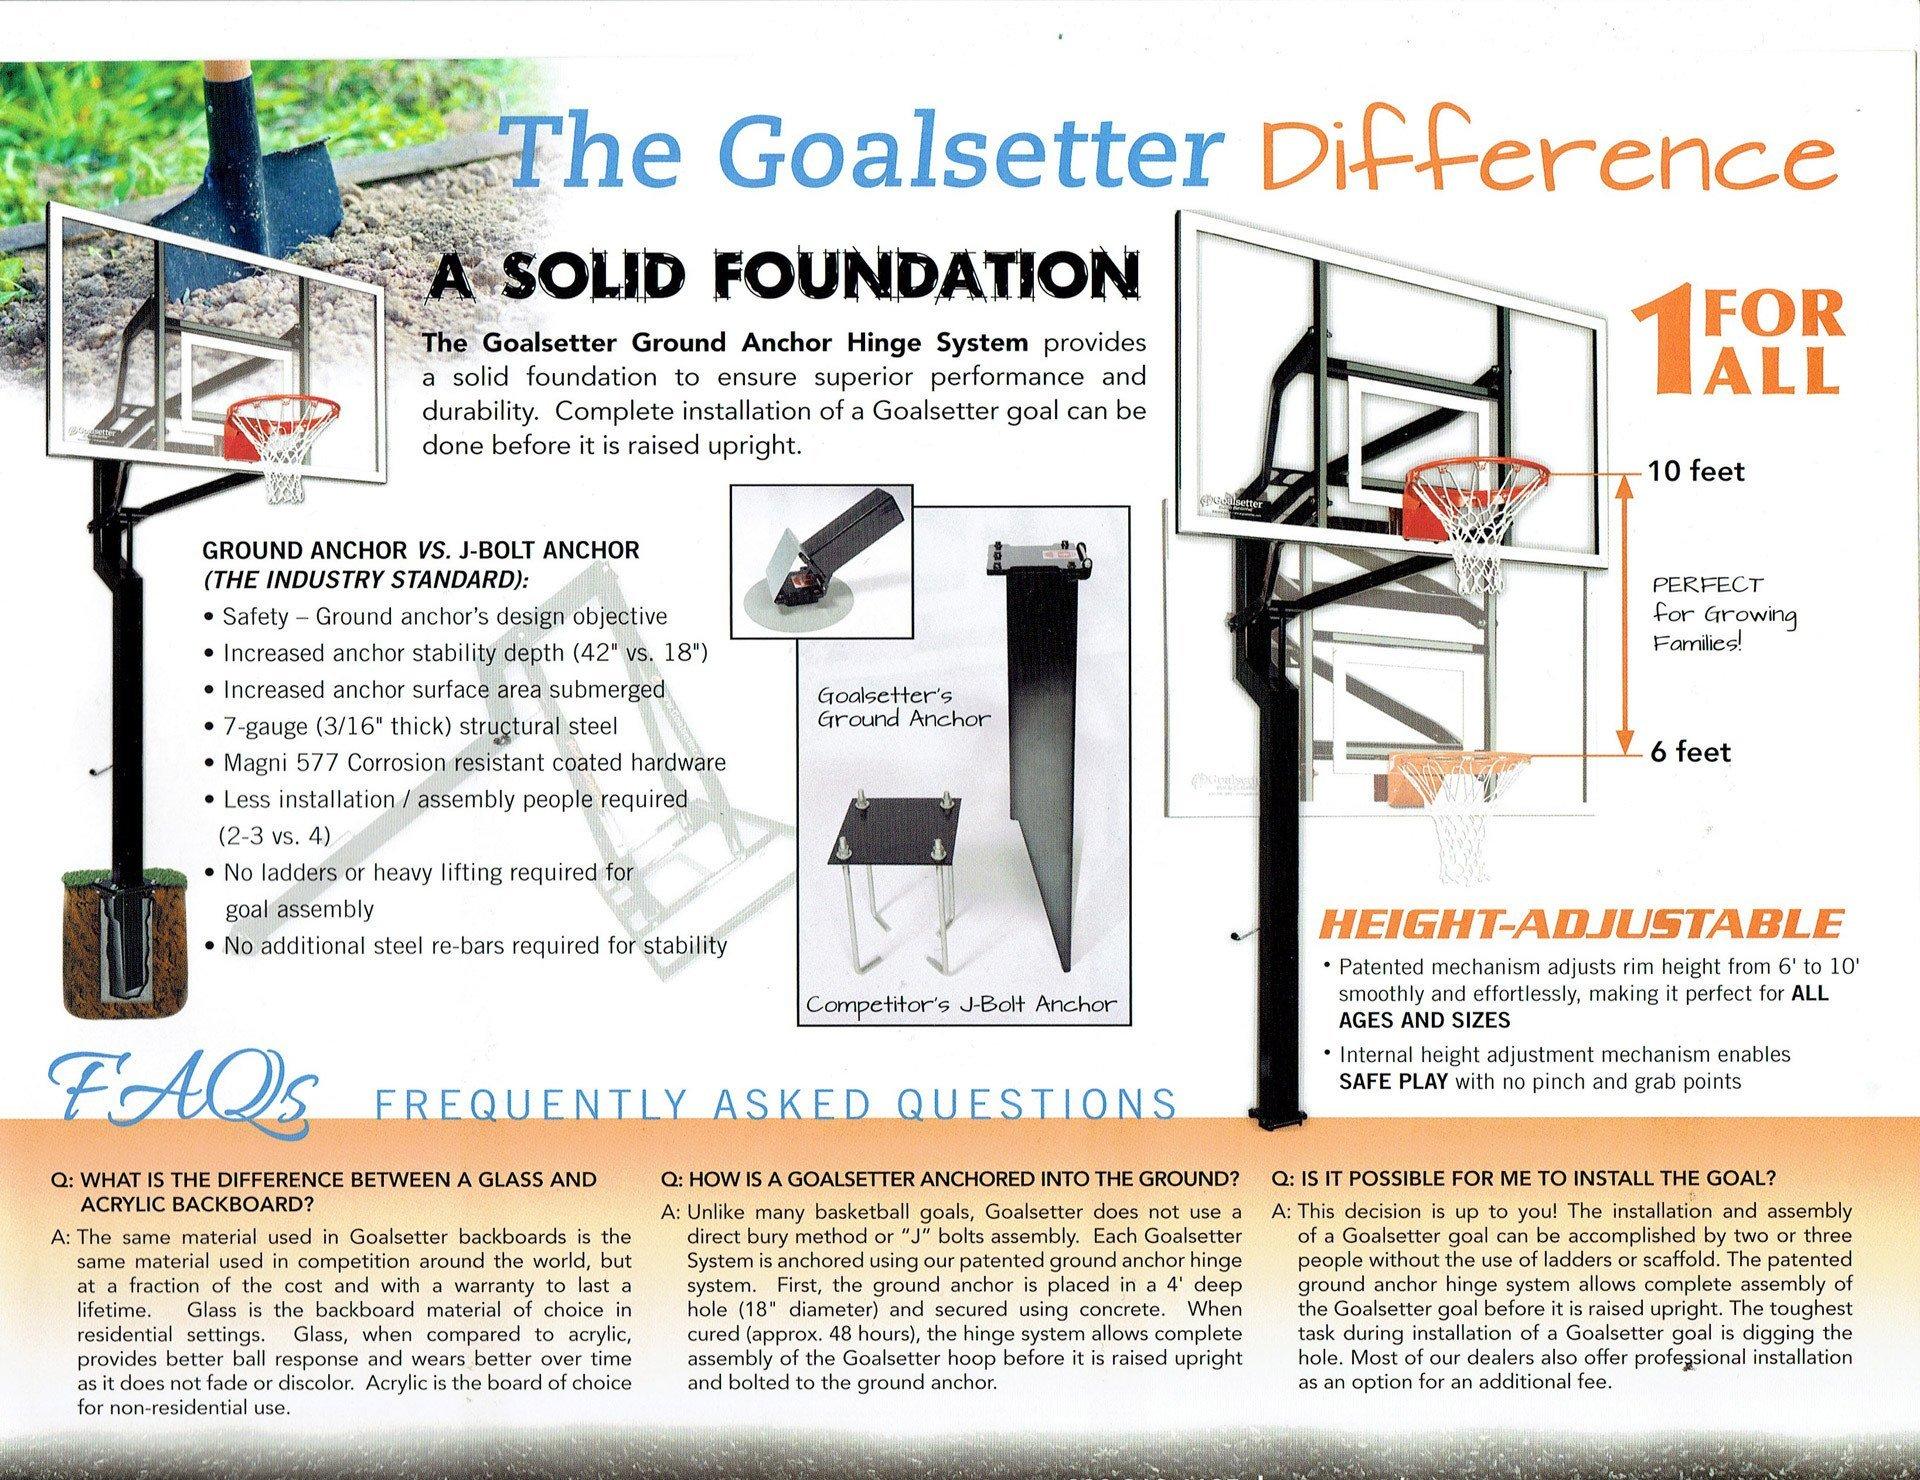 what sets goalsetter basketball systems apart - Wood Kingdom East - Coram, Long Island, Medford, The Hamptons